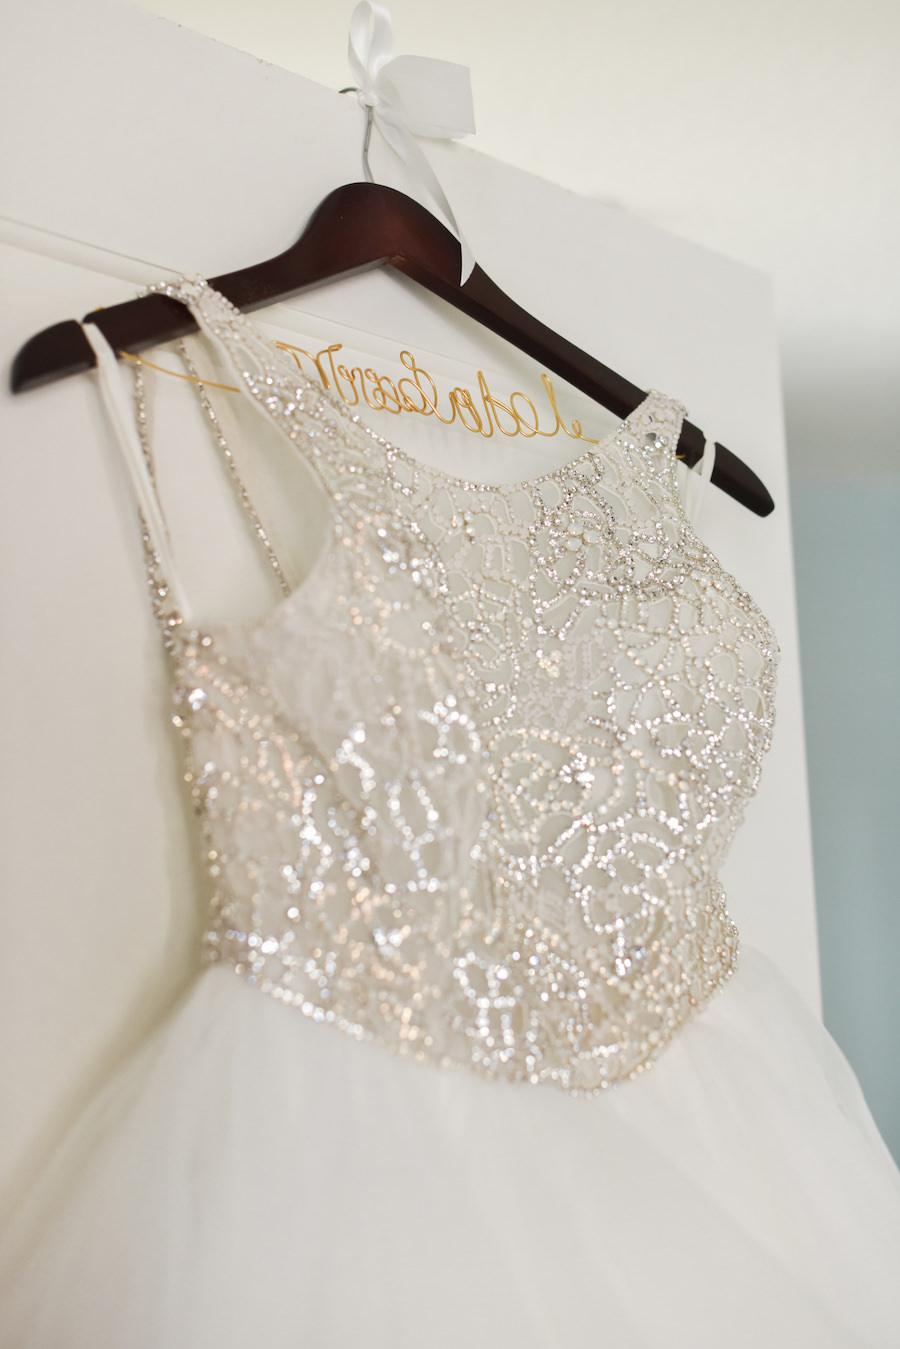 Hayley Paige Dori Wedding Dress with High Halter Neckline Beaded Bodice on Personalized Wooden Hangar